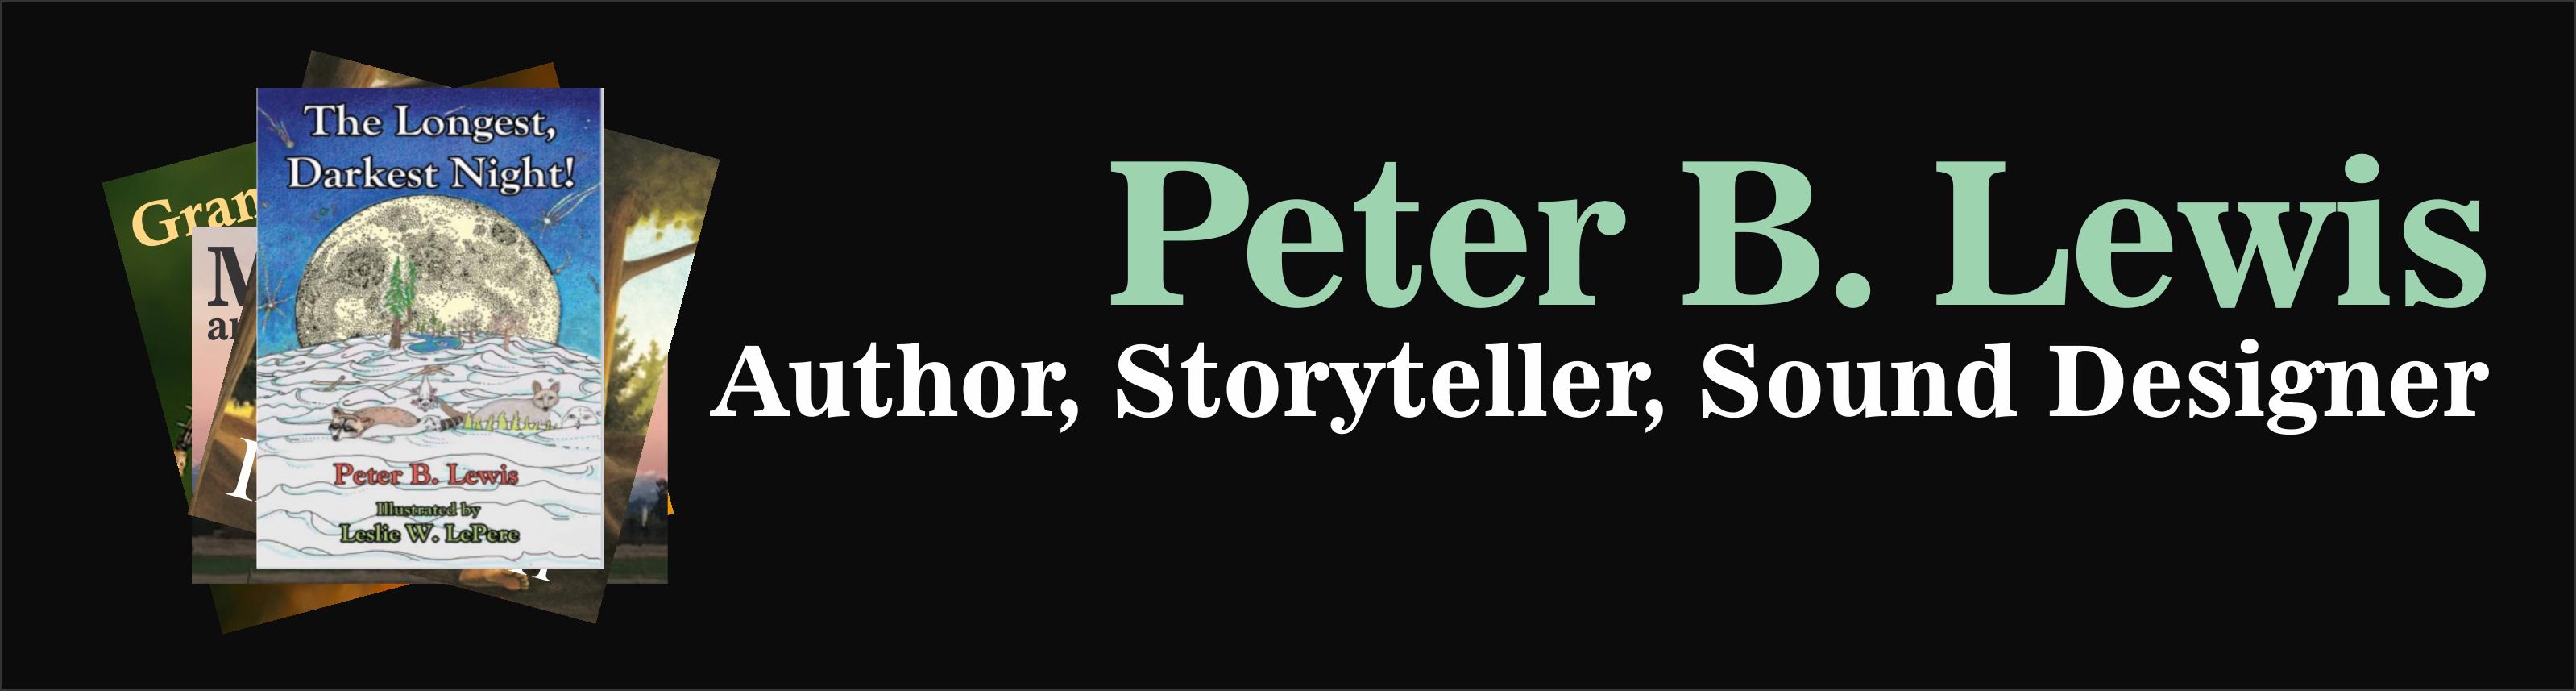 Peter B Stories